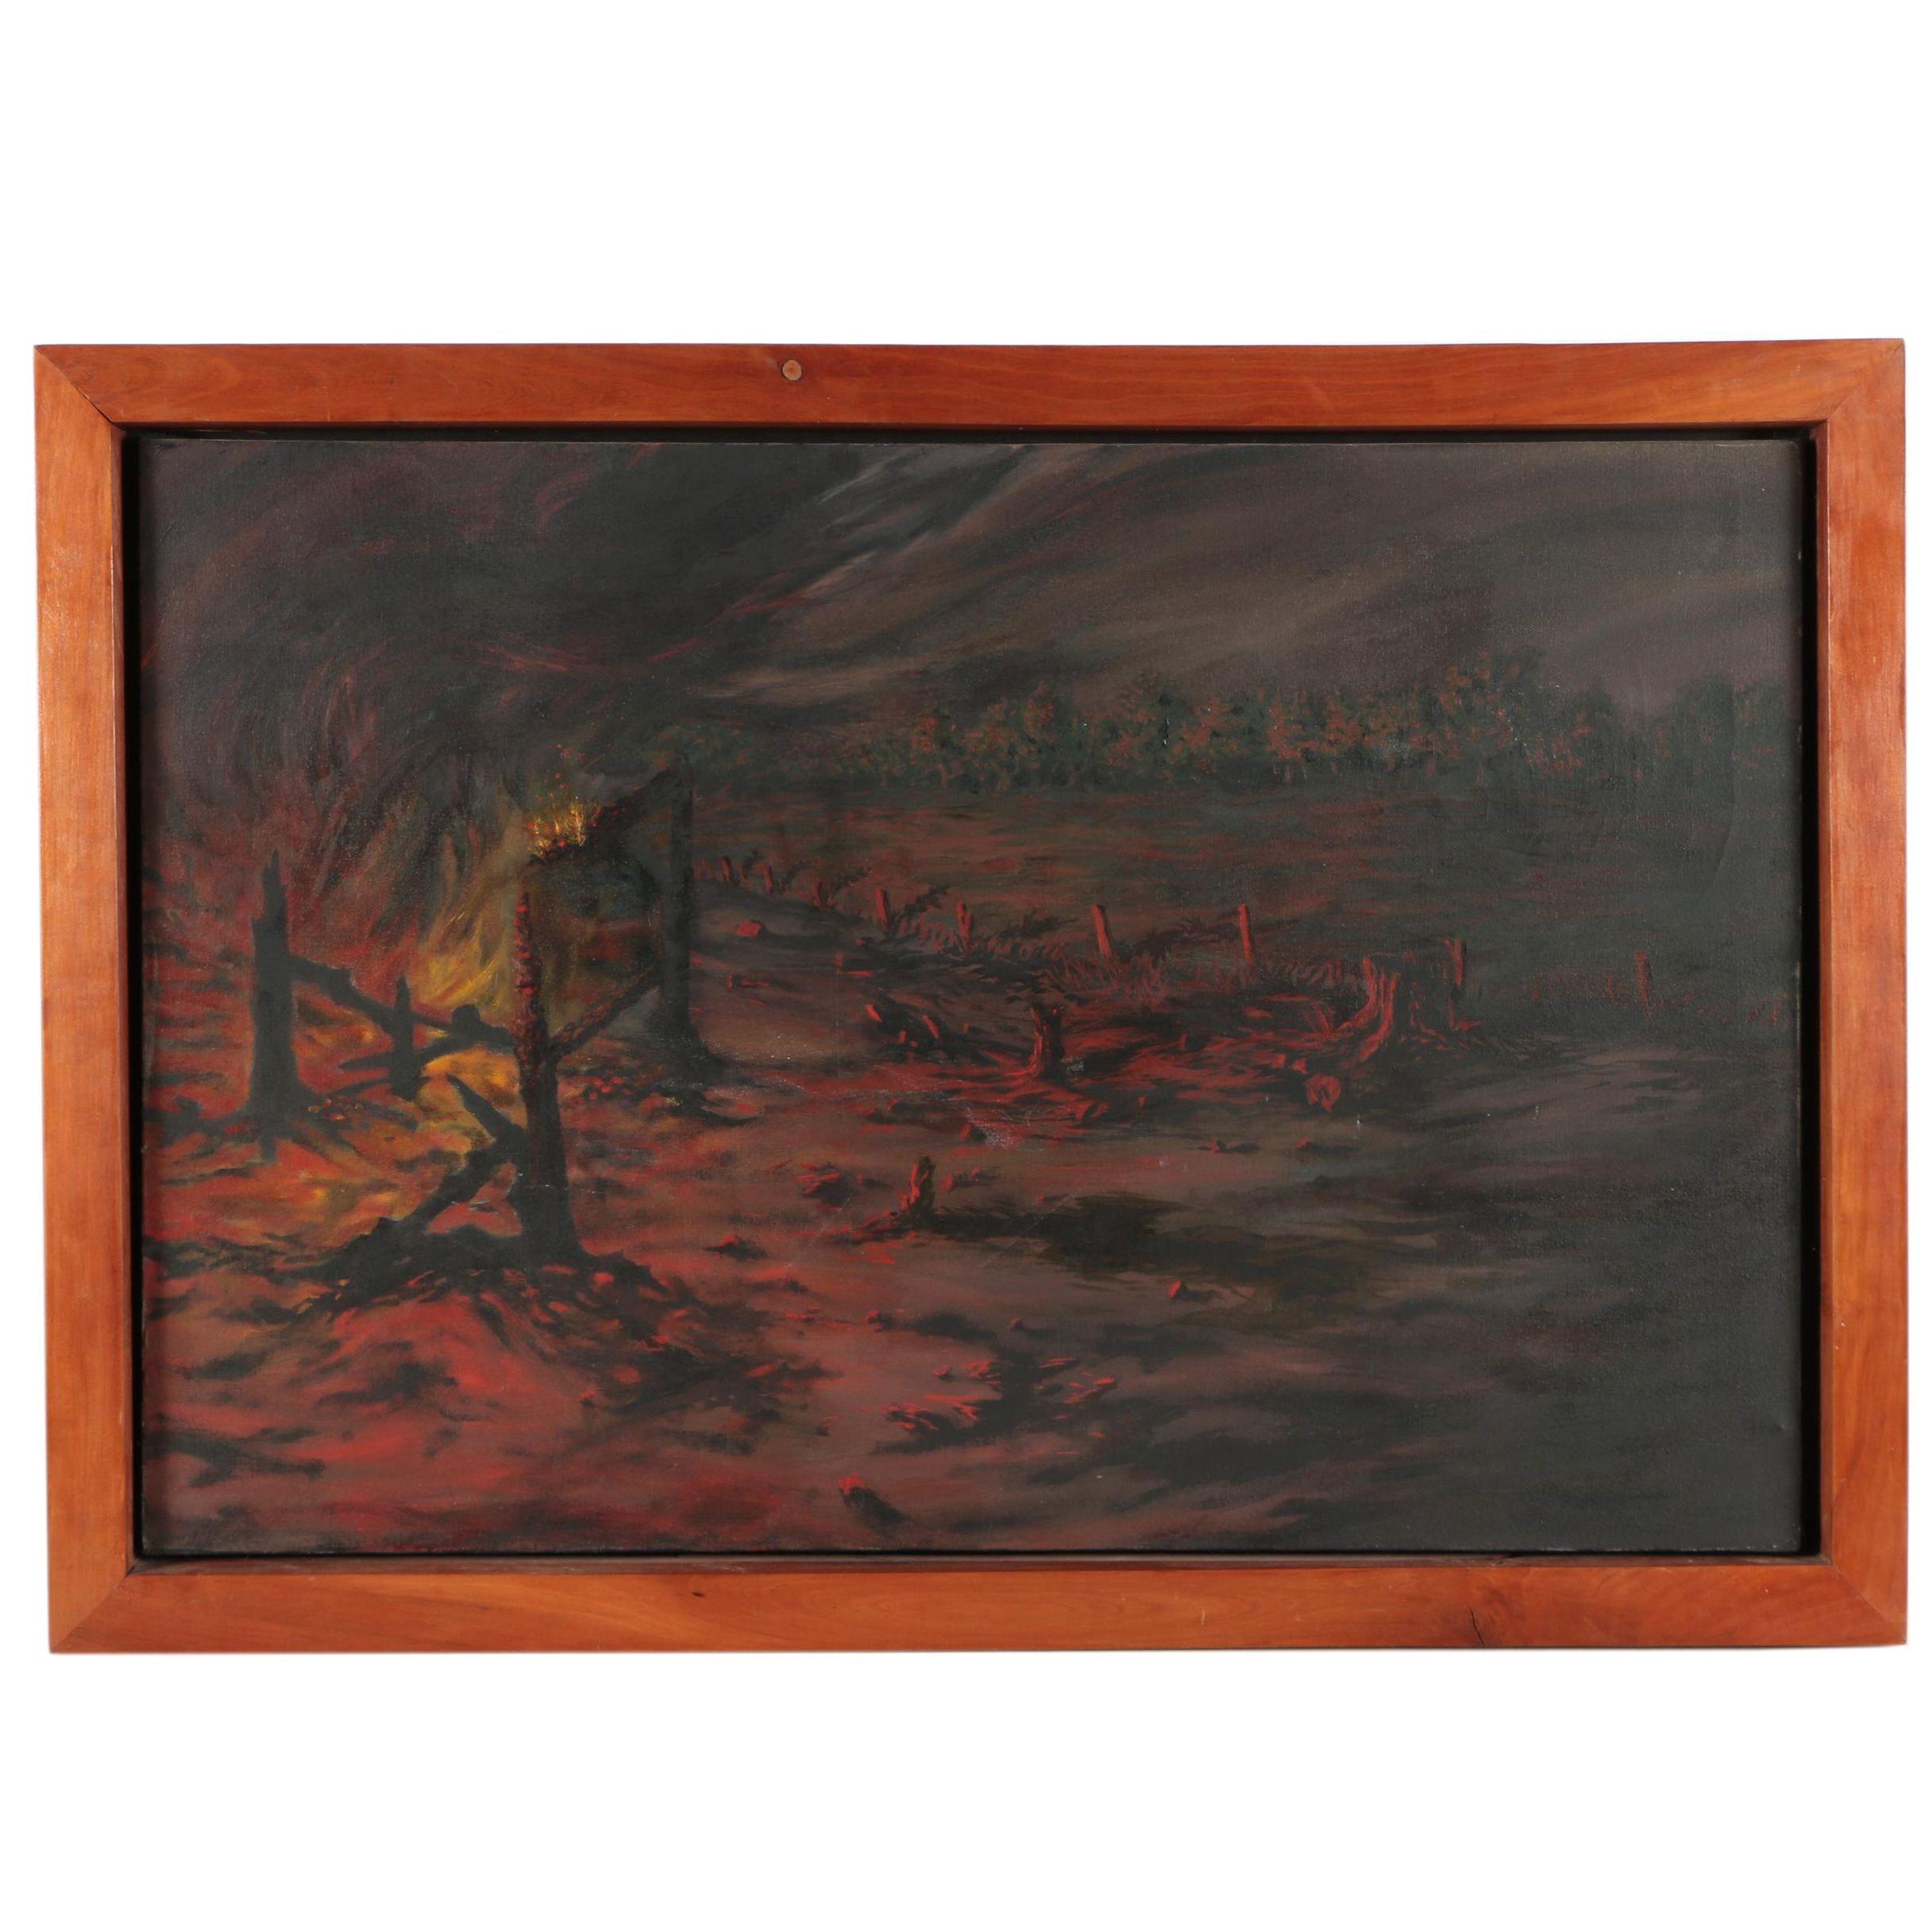 Acrylic Painting of a Burning Landscape